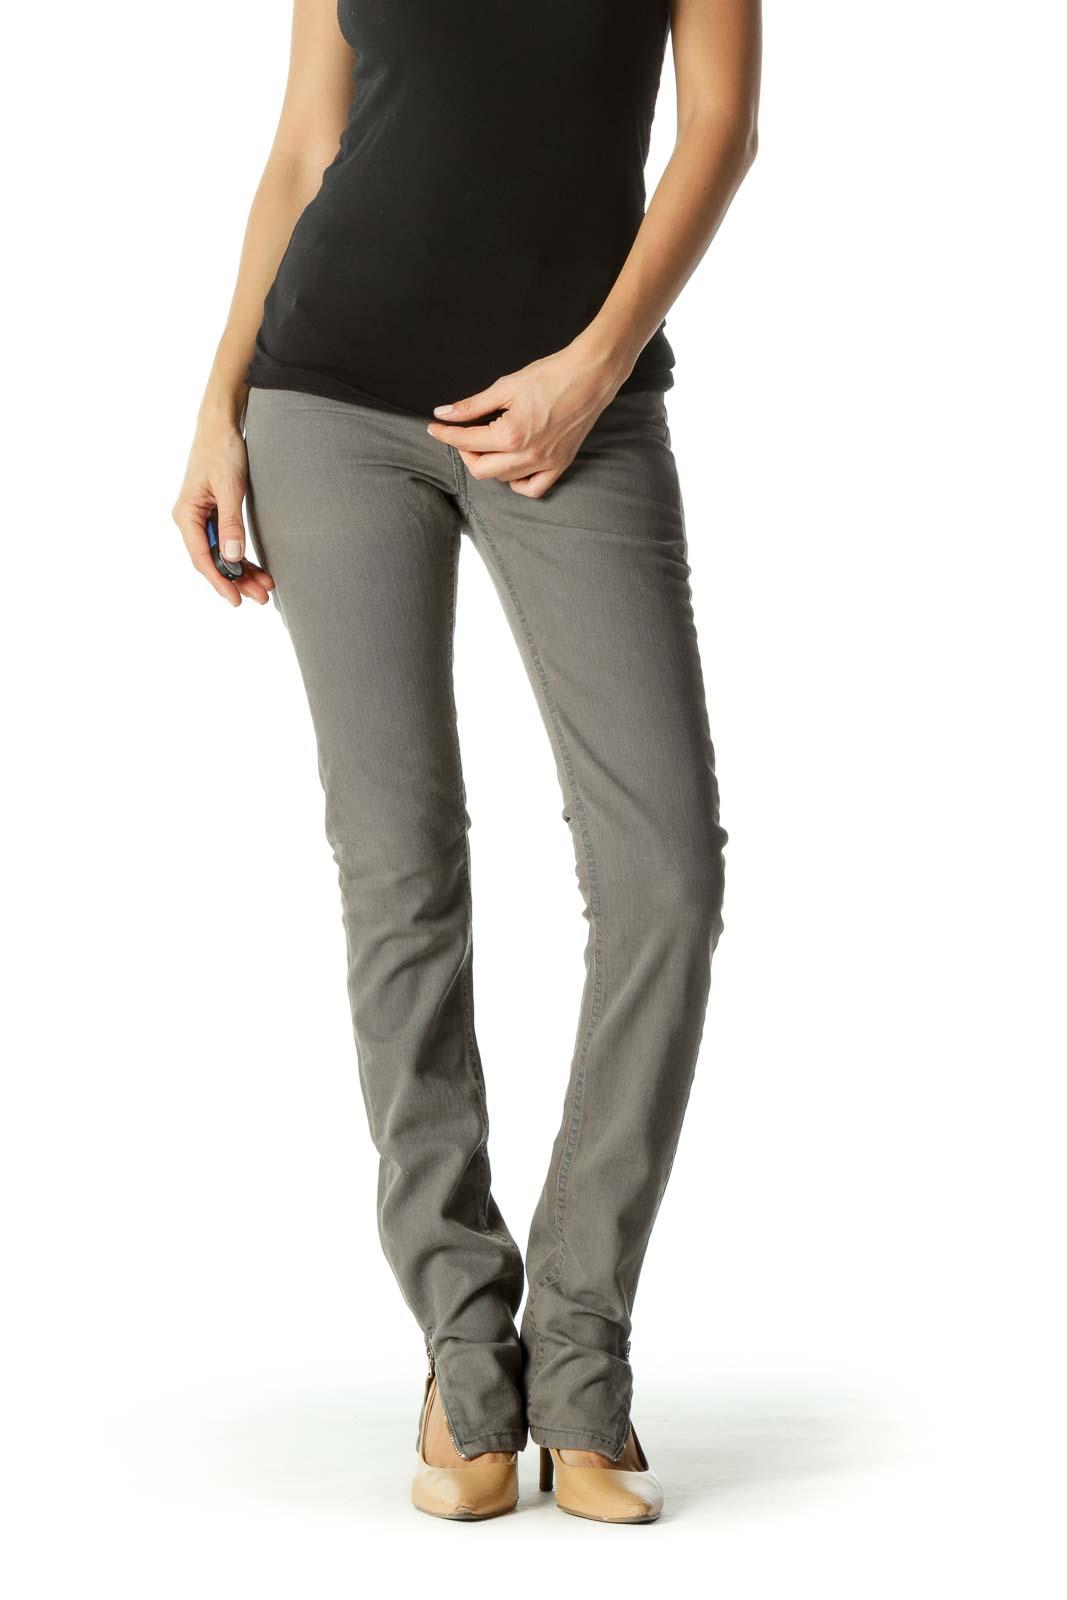 Gray Ankle Zippers Back Pocket Applique Slim Denim Pants